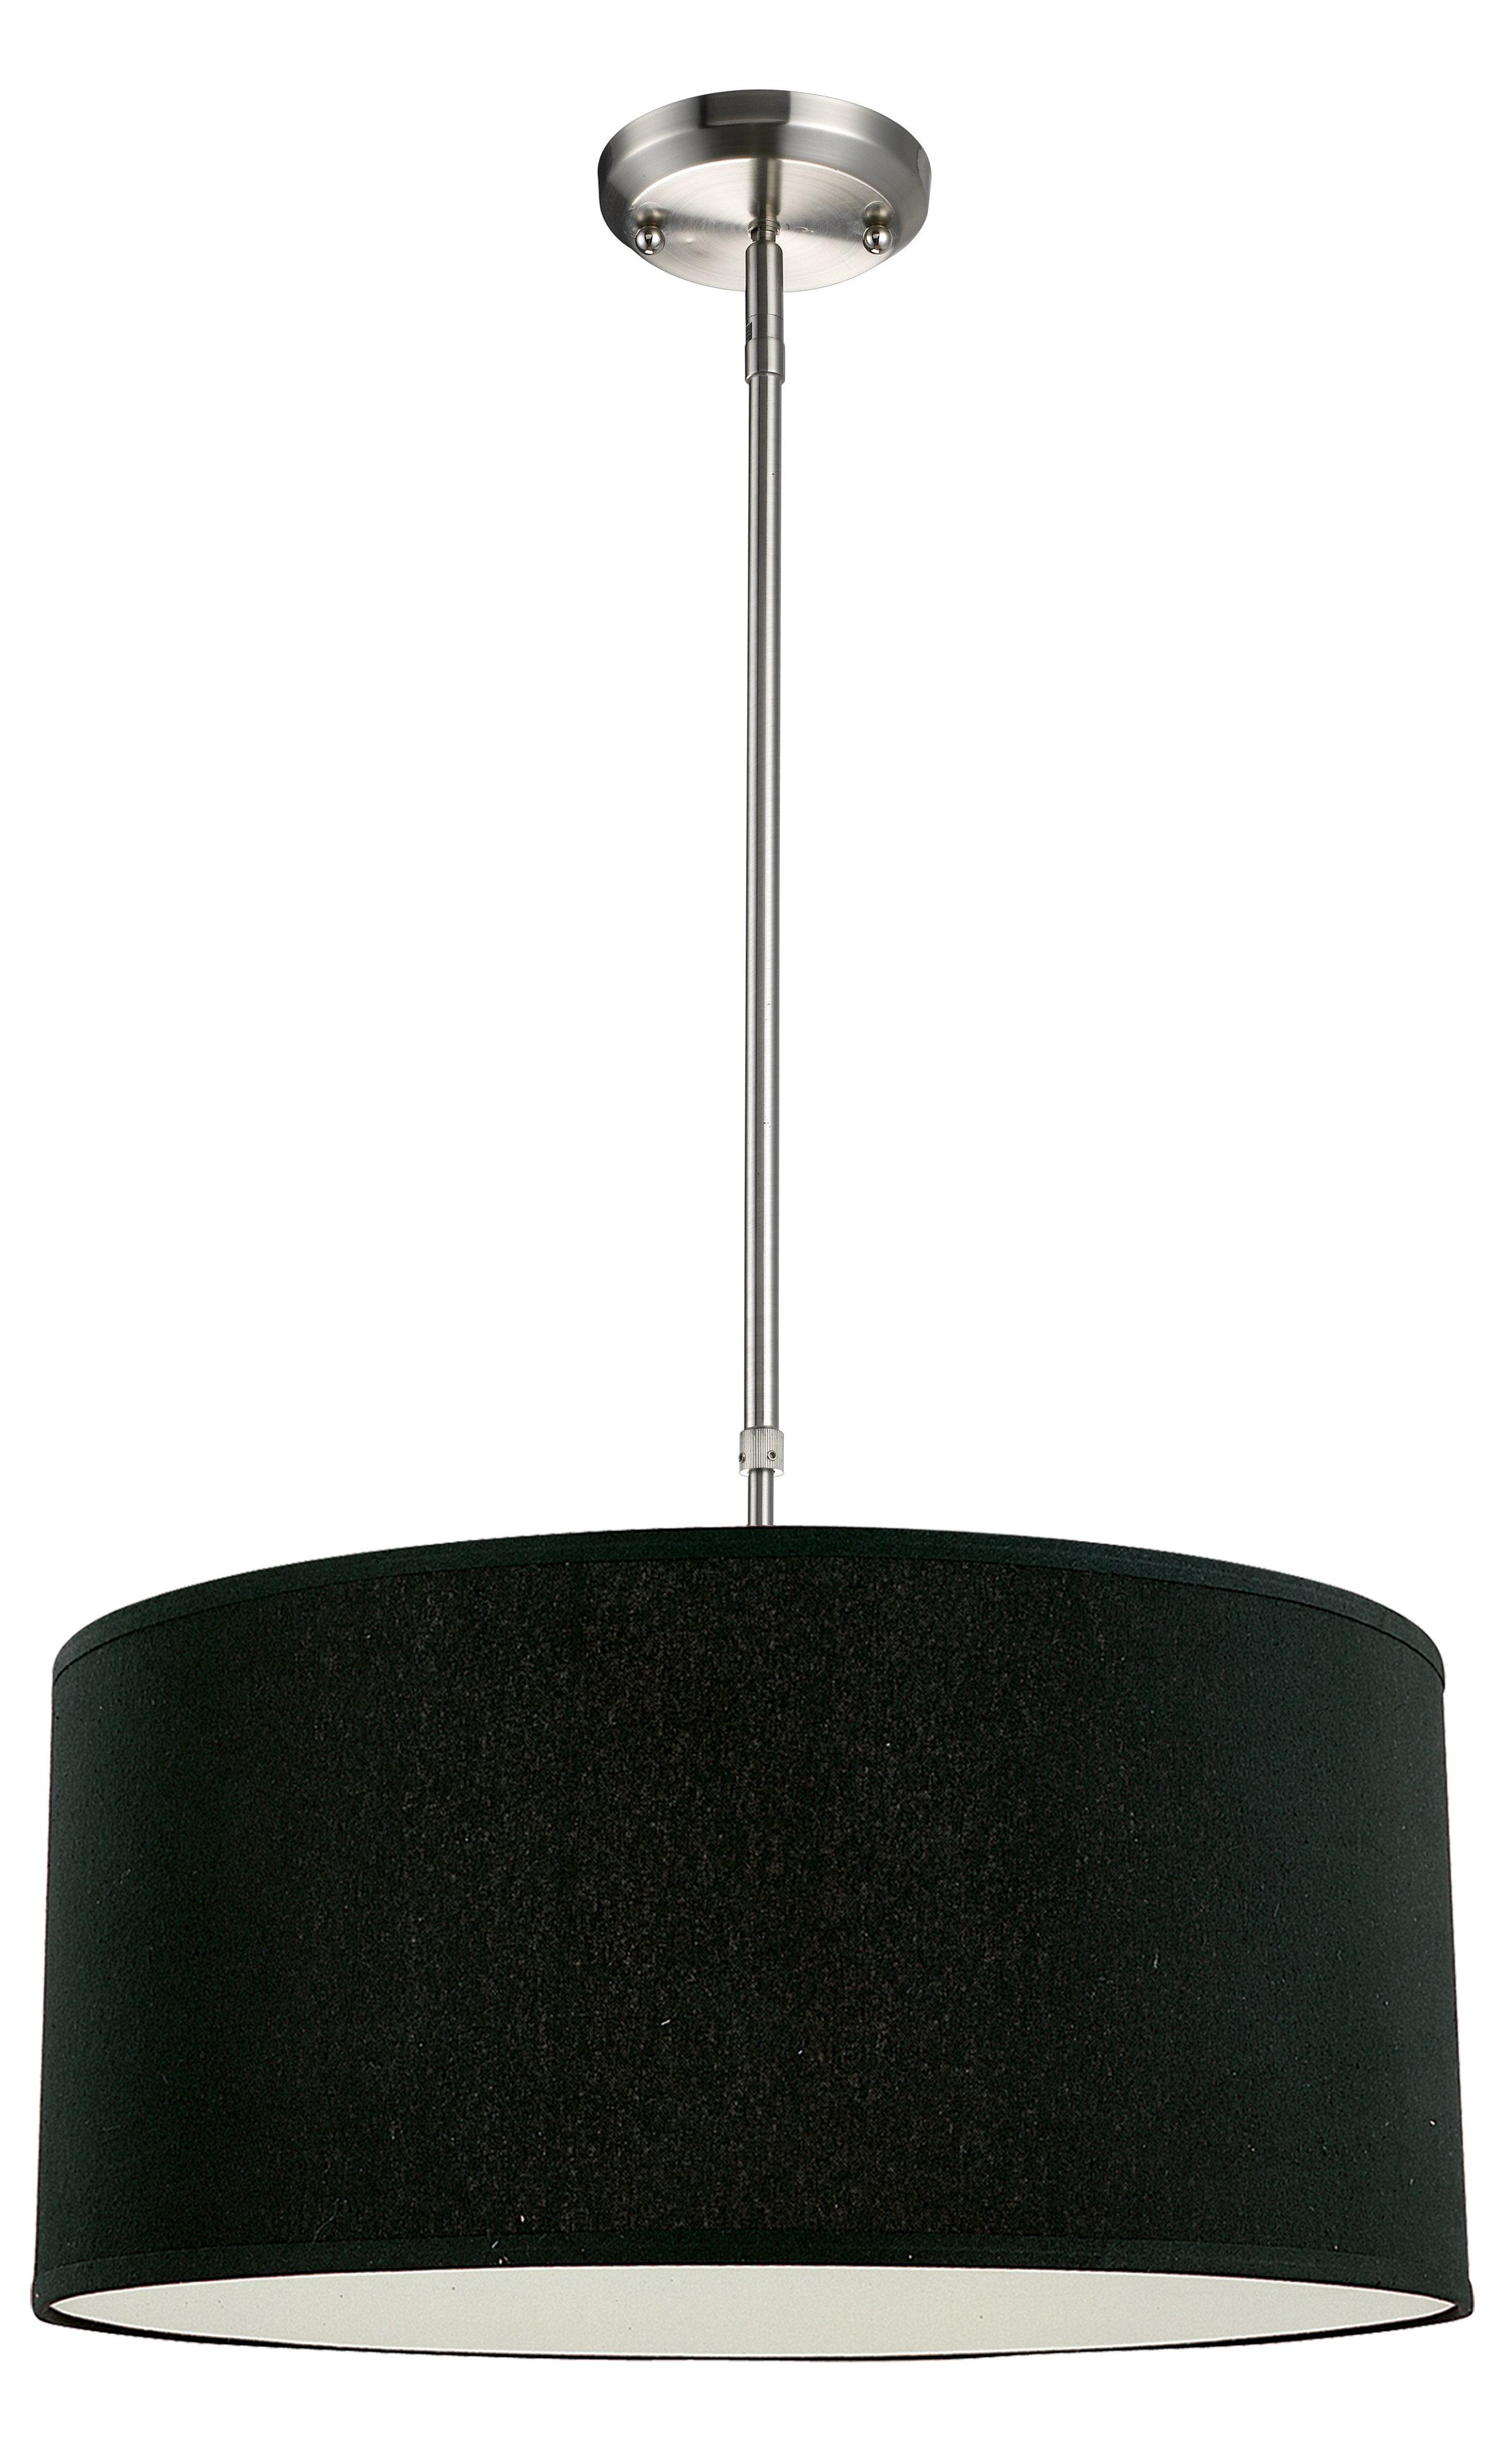 Kasey 3 Light Drum Pendant Pertaining To Radtke 3 Light Single Drum Pendants (Gallery 13 of 30)